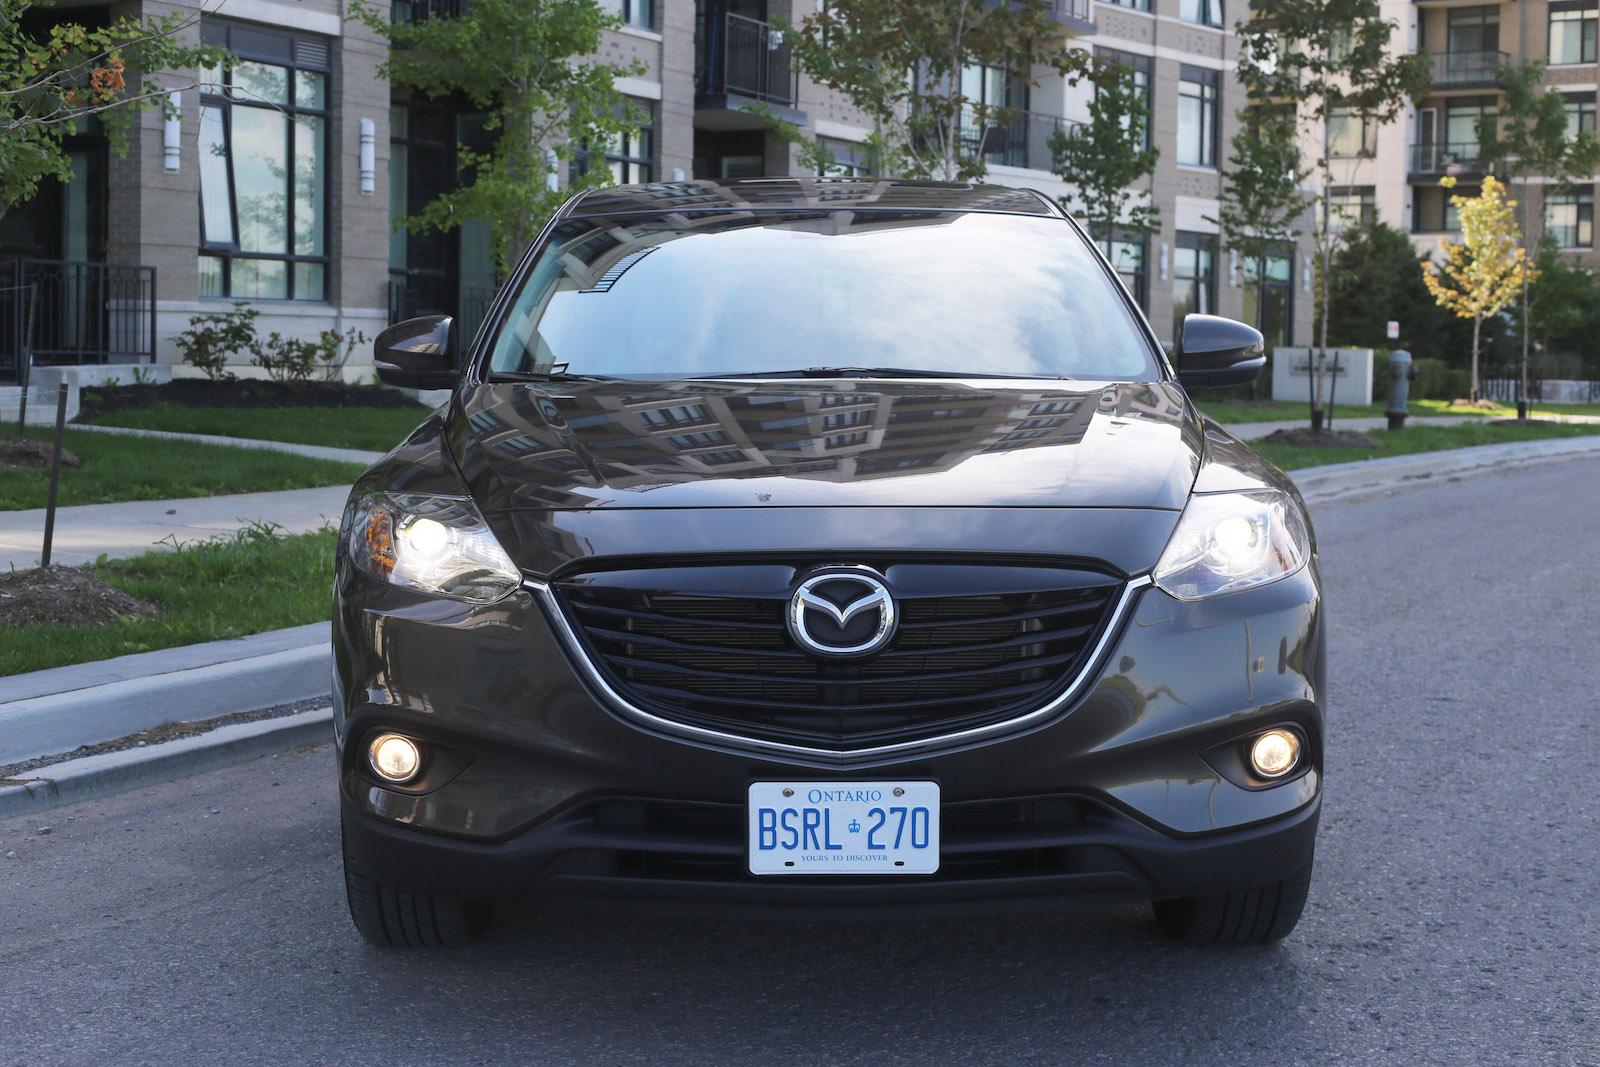 Mazda mazda cx 9 front grill : Review: 2015 Mazda CX-9 GT | Canadian Auto Review